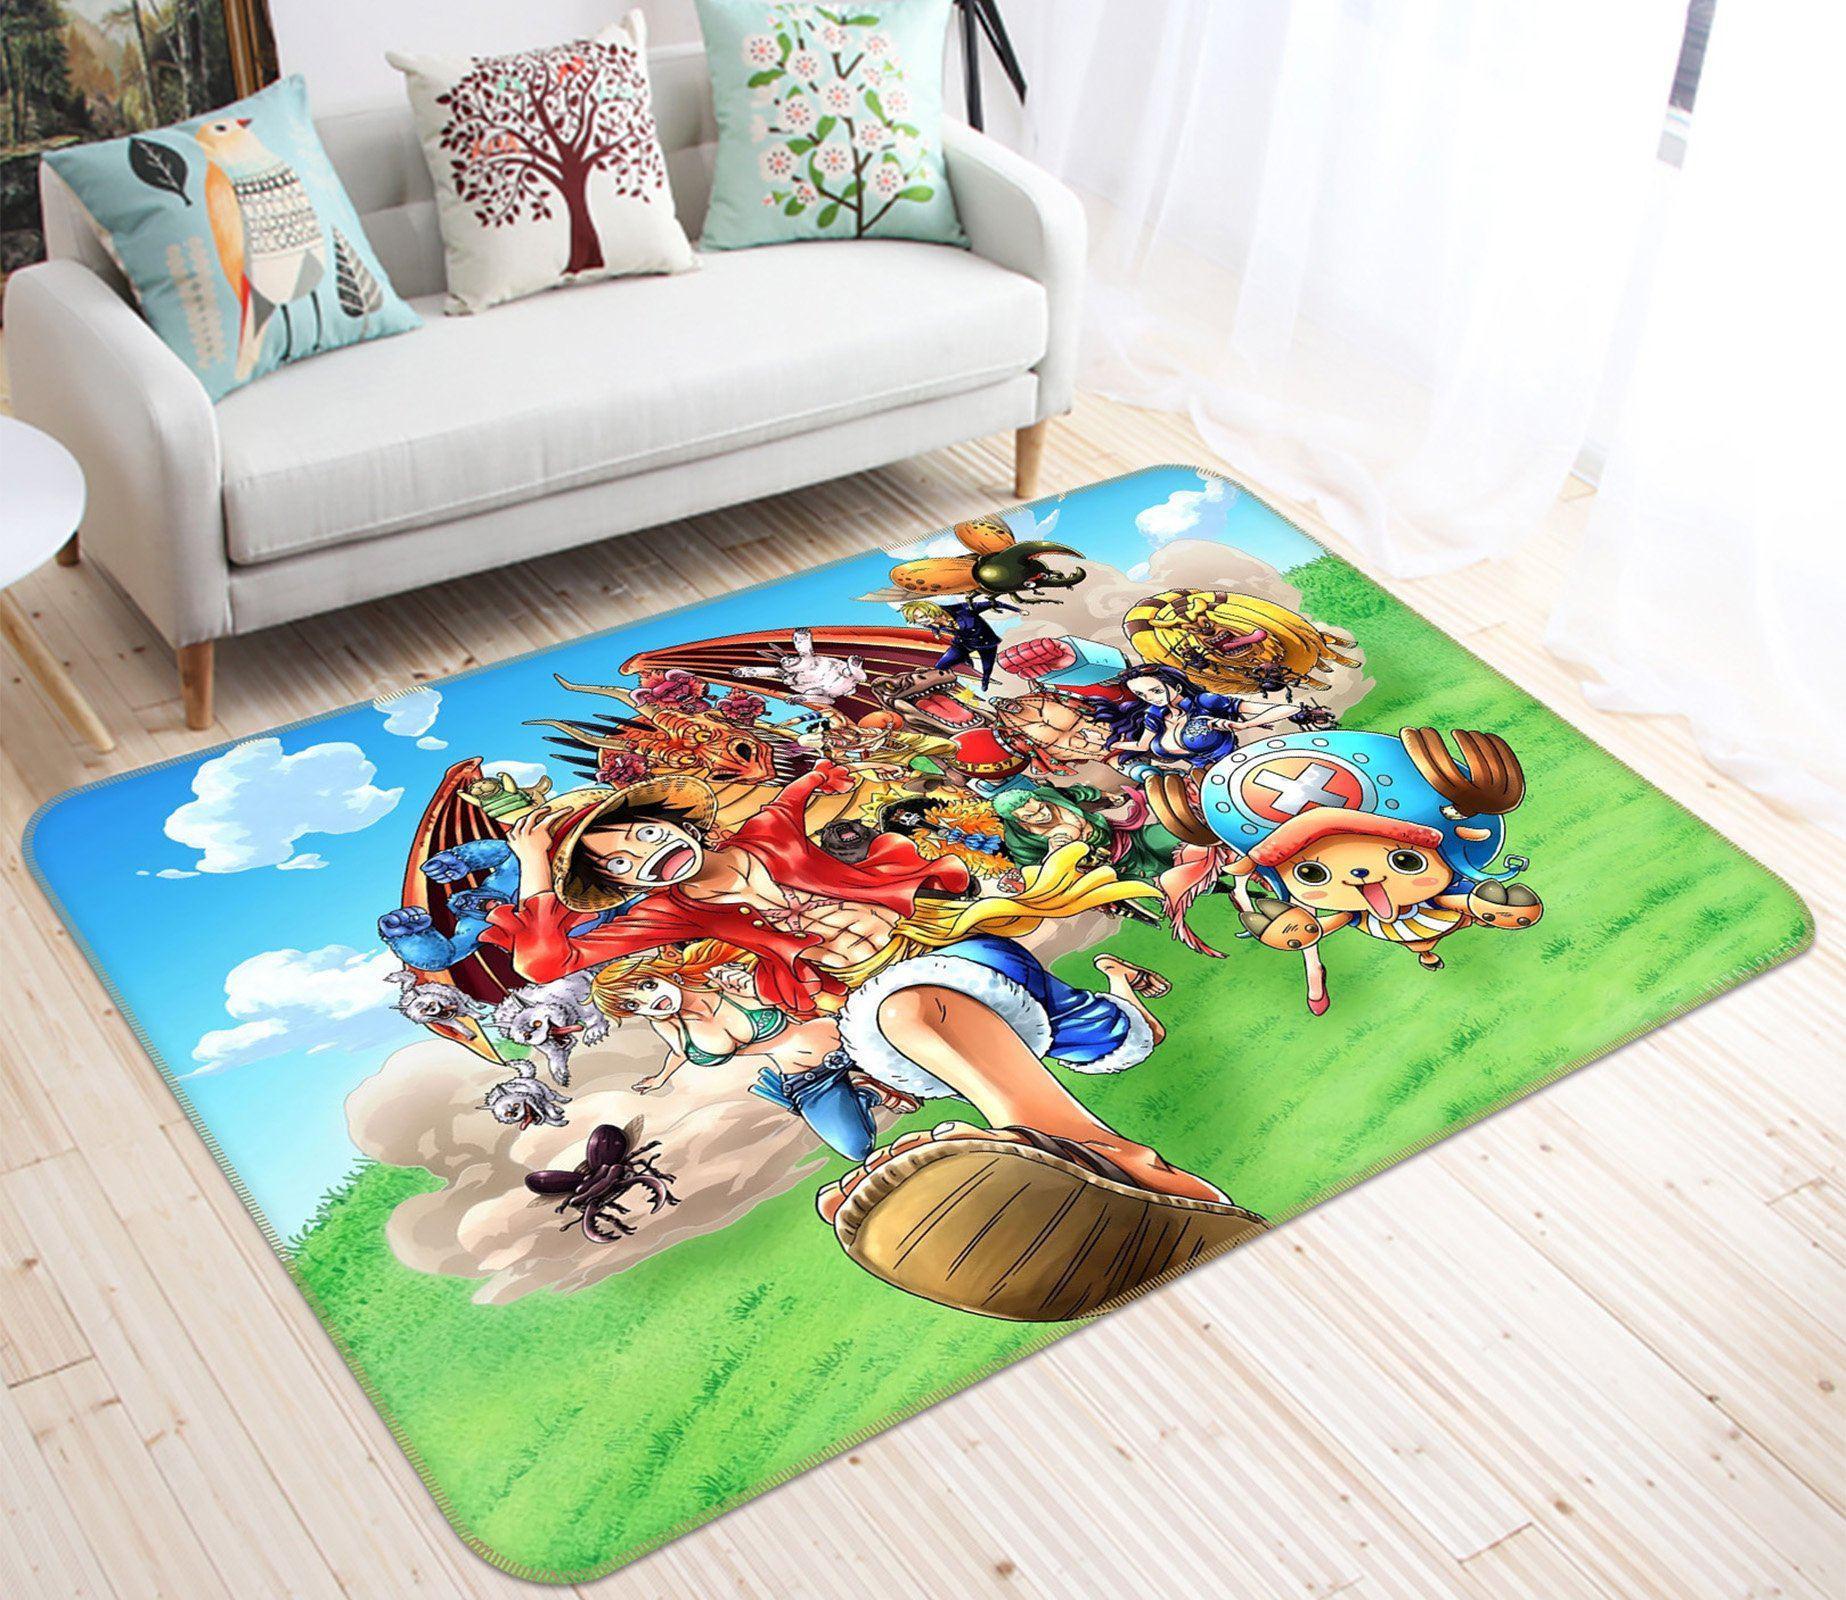 Details about  /3D Tokyo Ghoul 916 Japan Anime Non Slip Rug Mat Round Elegant Carpet AU